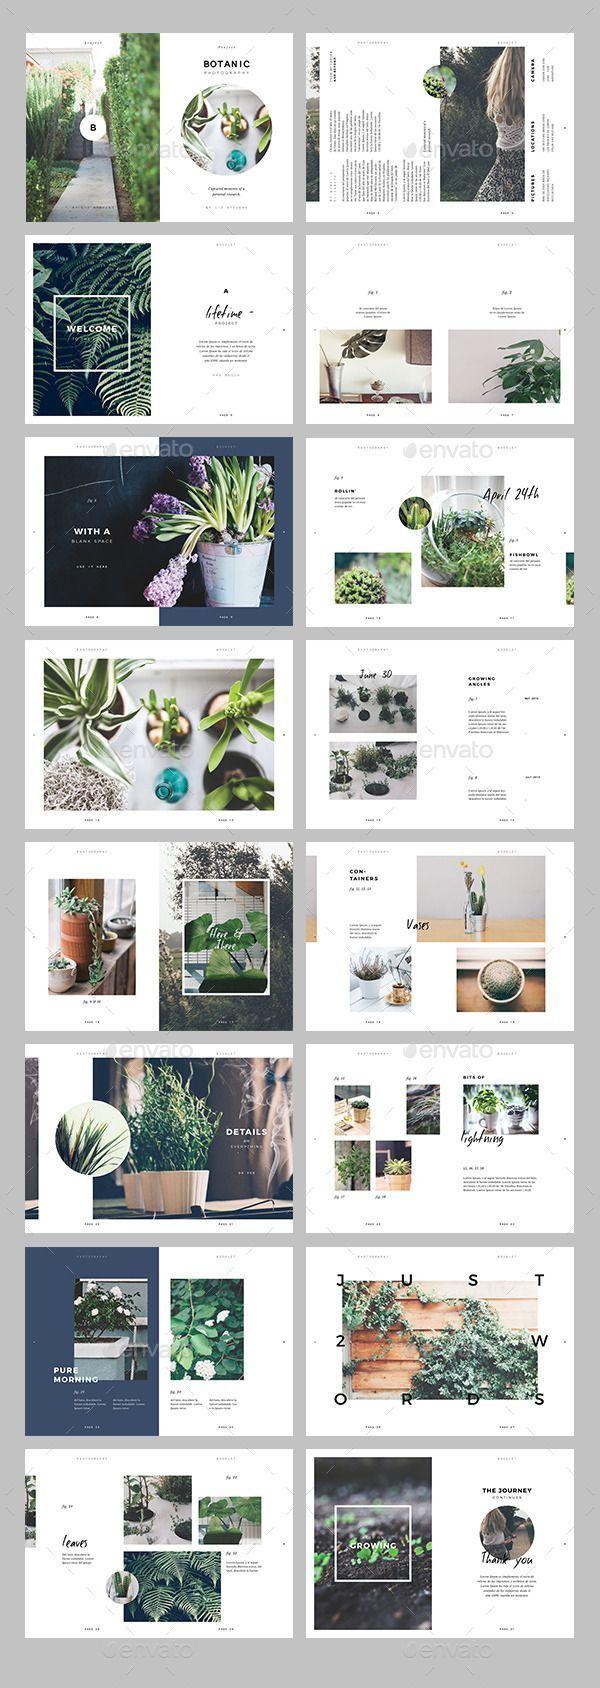 Publication Design | http://www.lab333.com  www.facebook.com/pages/LAB-STYLE/585086788169863  http://www.lab333style.com https://instagram.com/lab_333 http://lablikes.tumblr.com  www.pinterest.com/labstyle